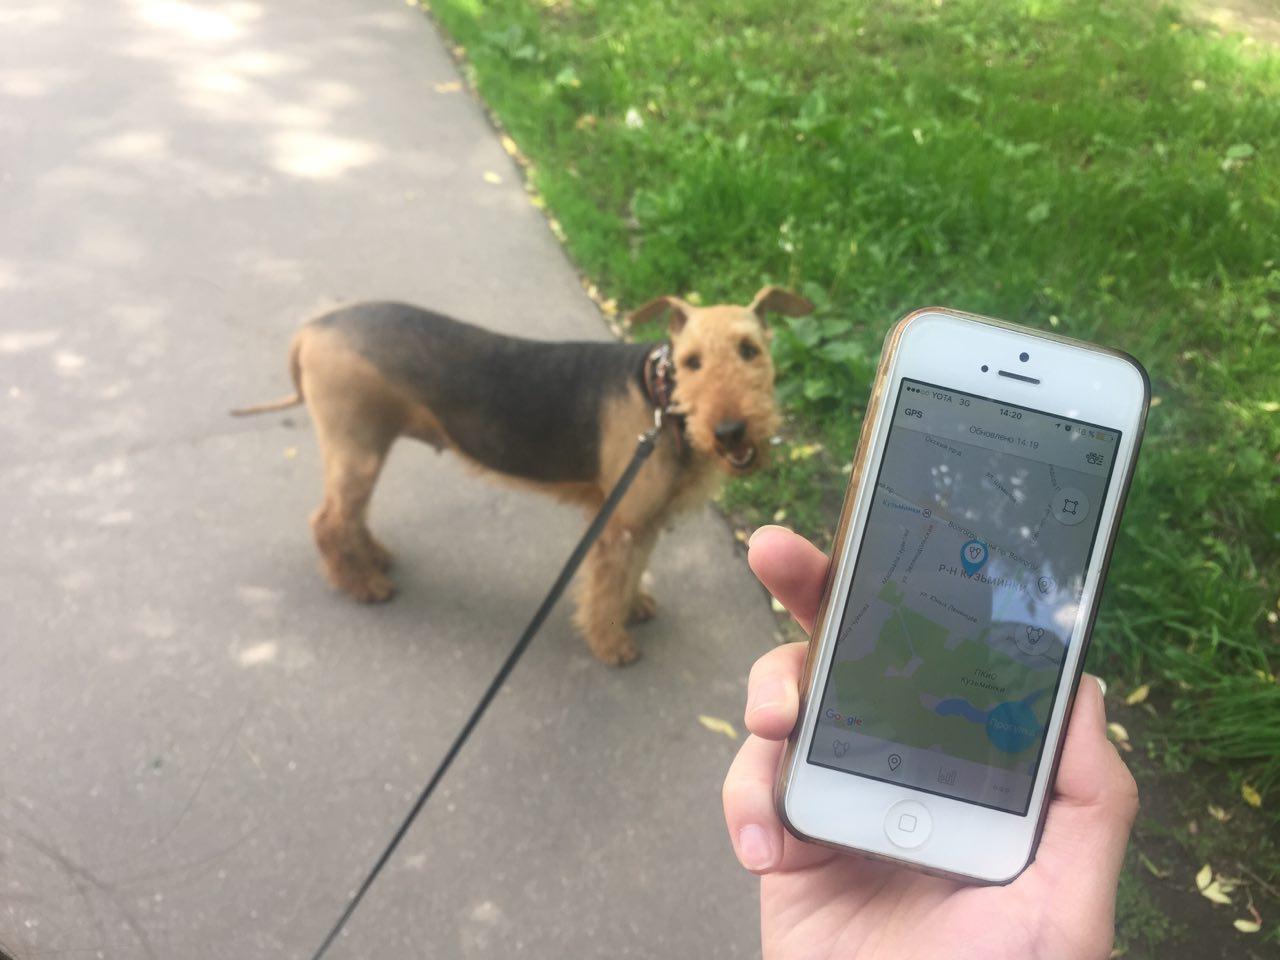 Как работает сервис по выгулу собак «Собака-гуляка» - 5